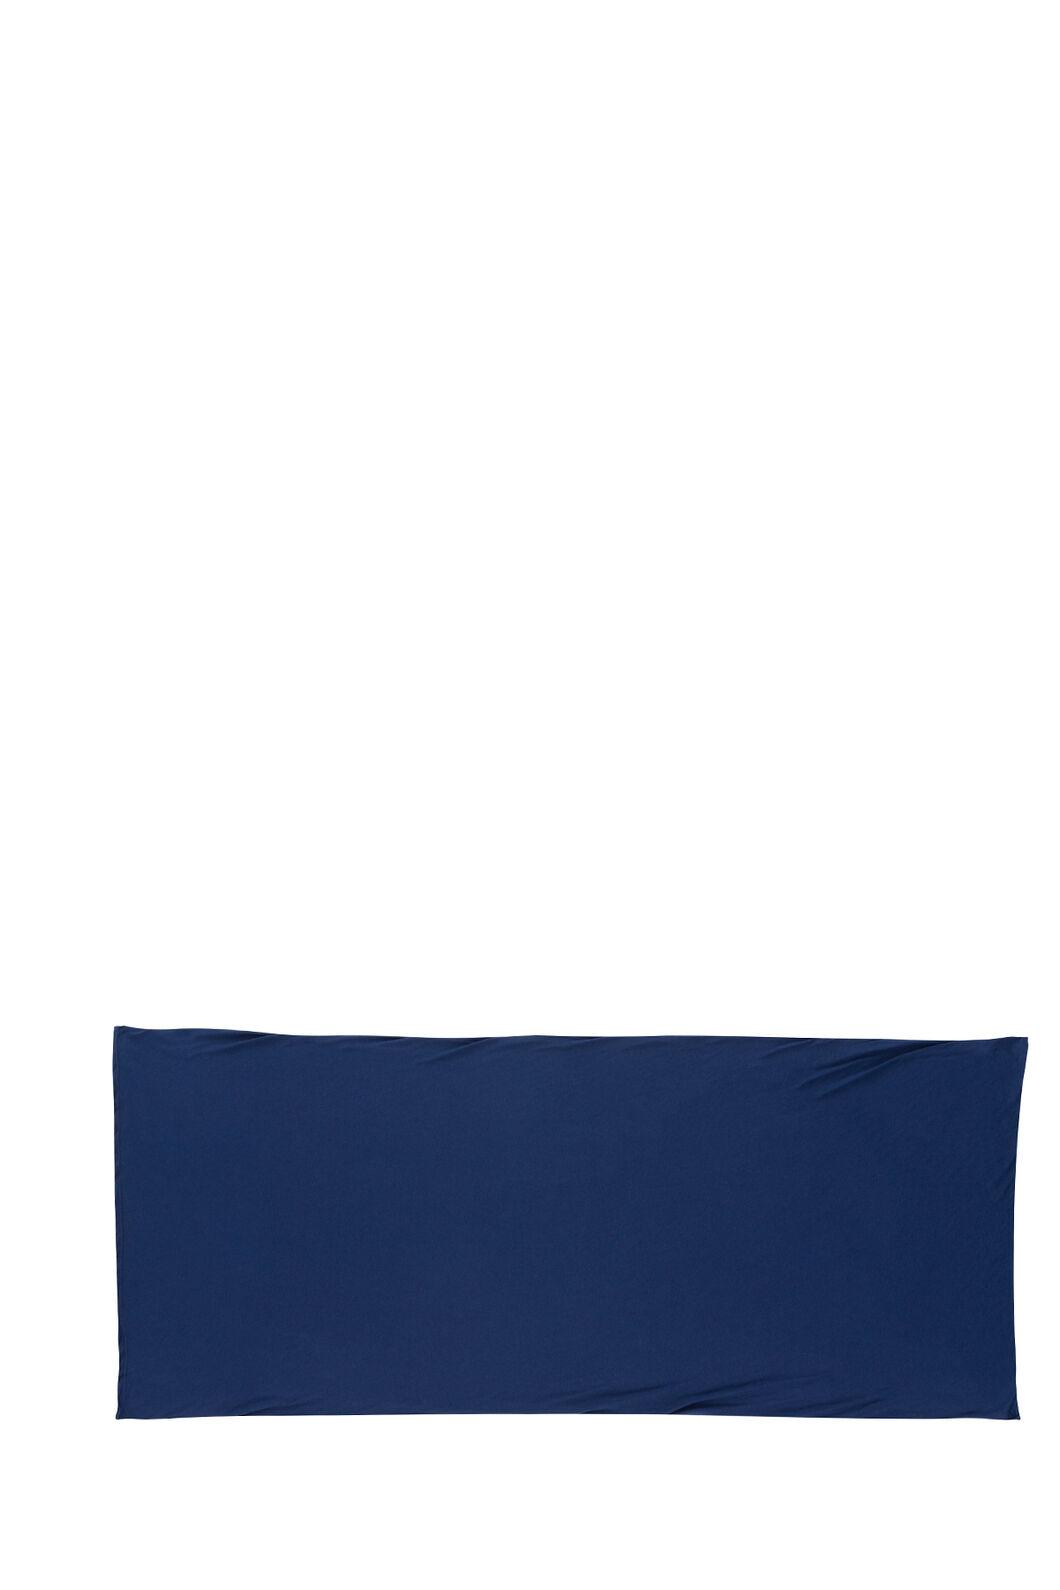 Sea to Summit Expander Sleeping Bag Liner Standard, None, hi-res